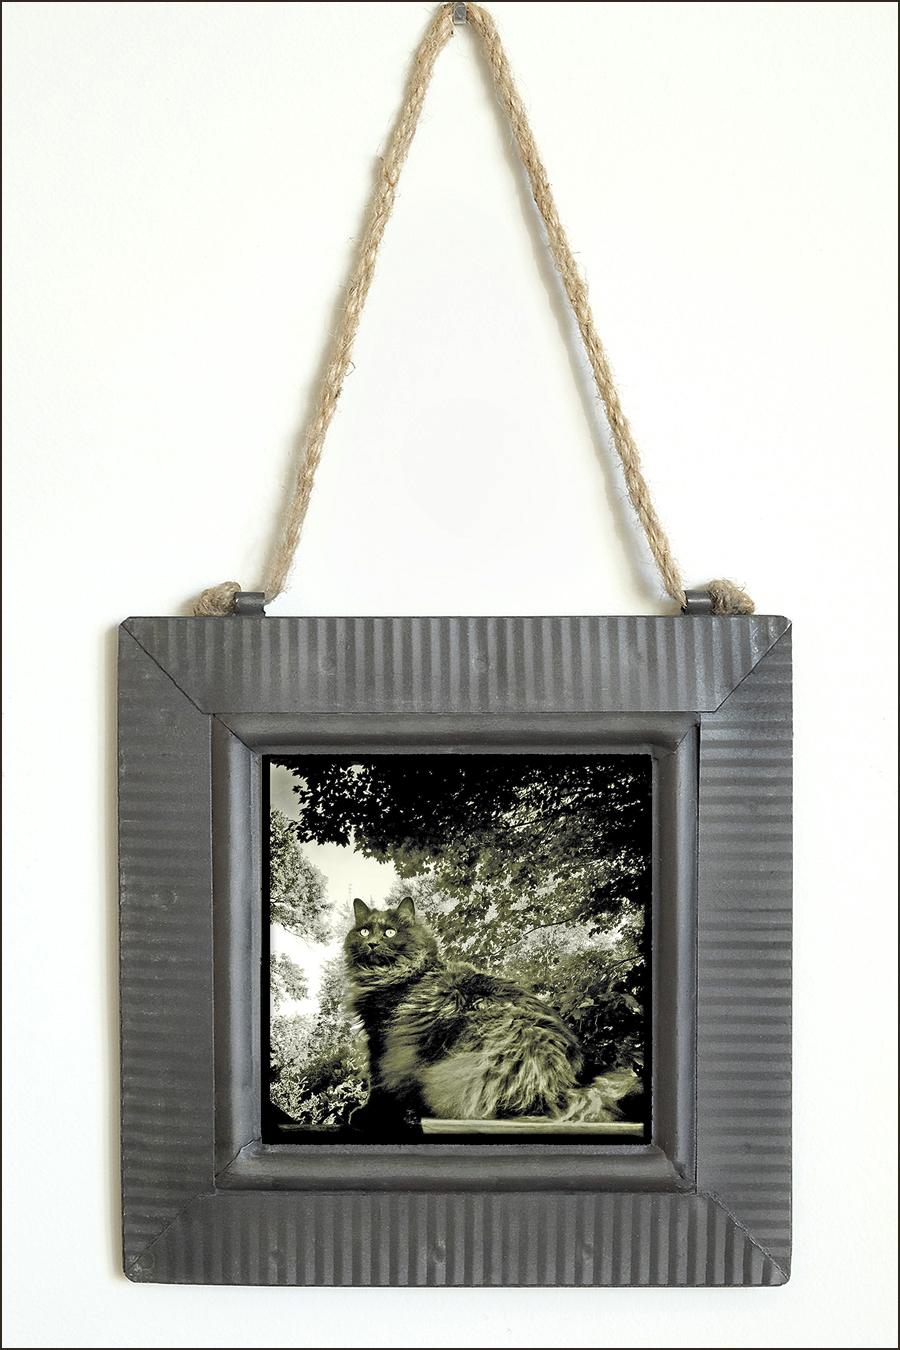 Robin Davis Photography - The LIttle Gems prints on metal